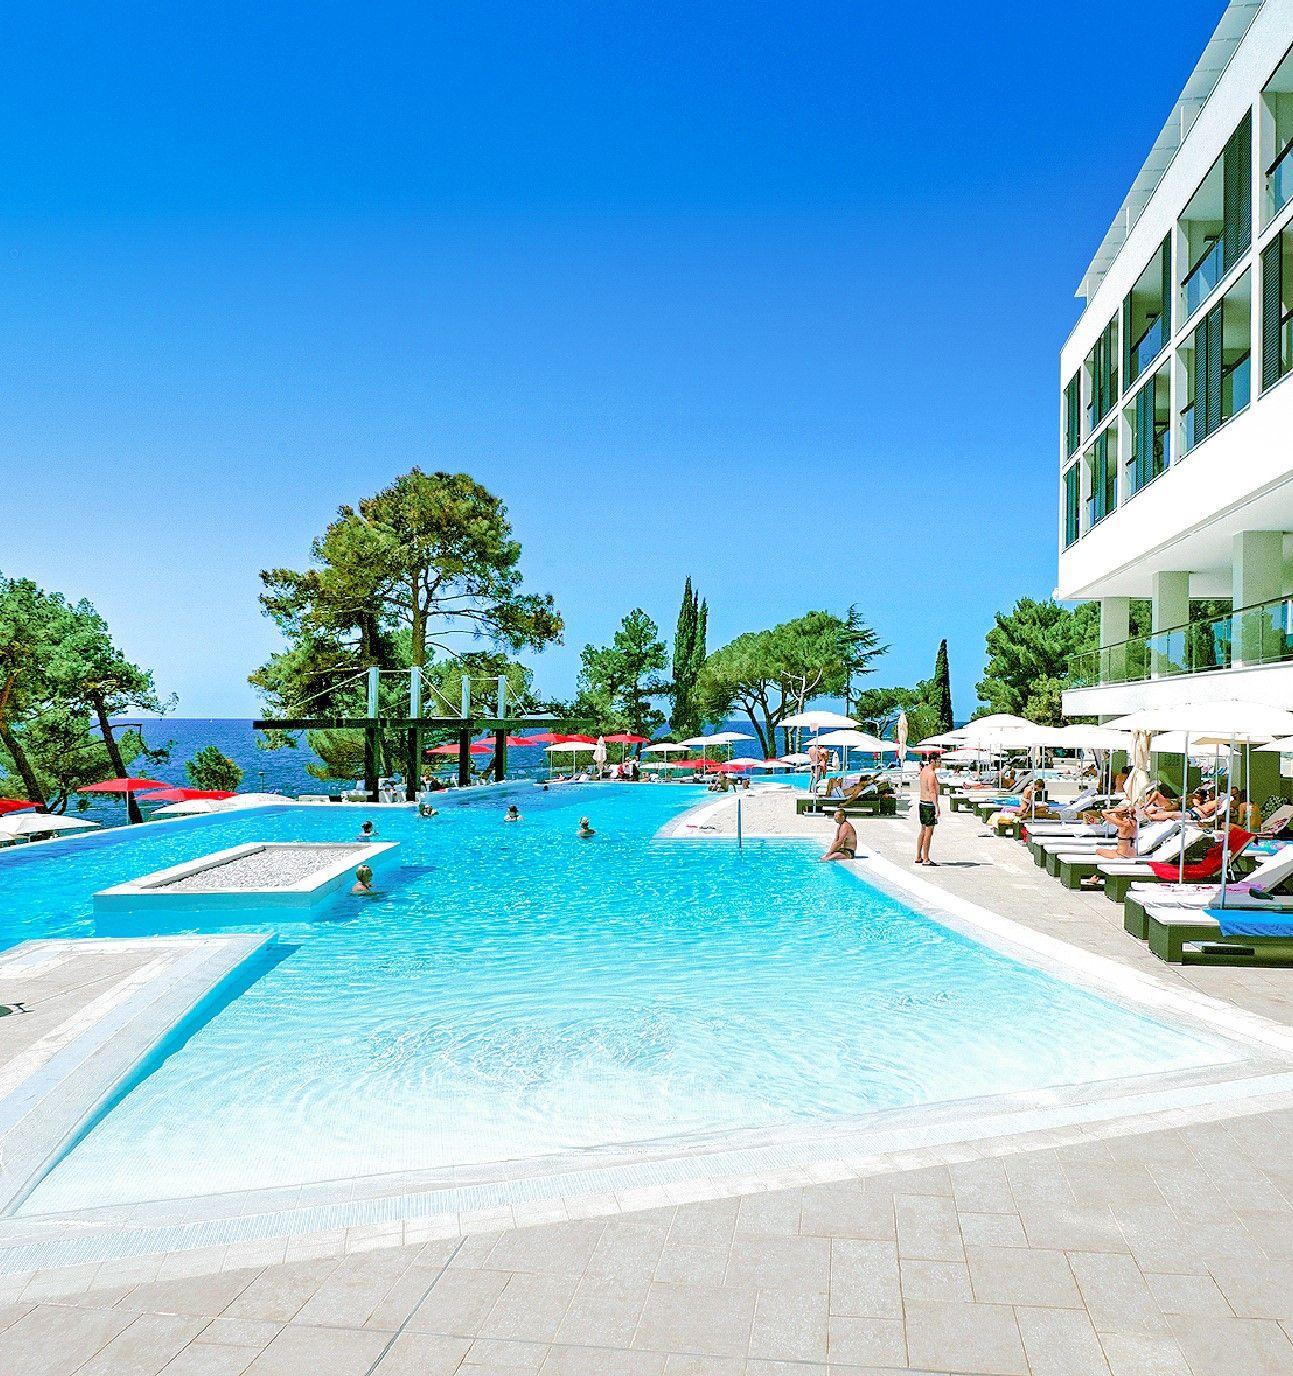 Kroatien, Kroatien Urlaub Laguna Parentium Hotel, Pool